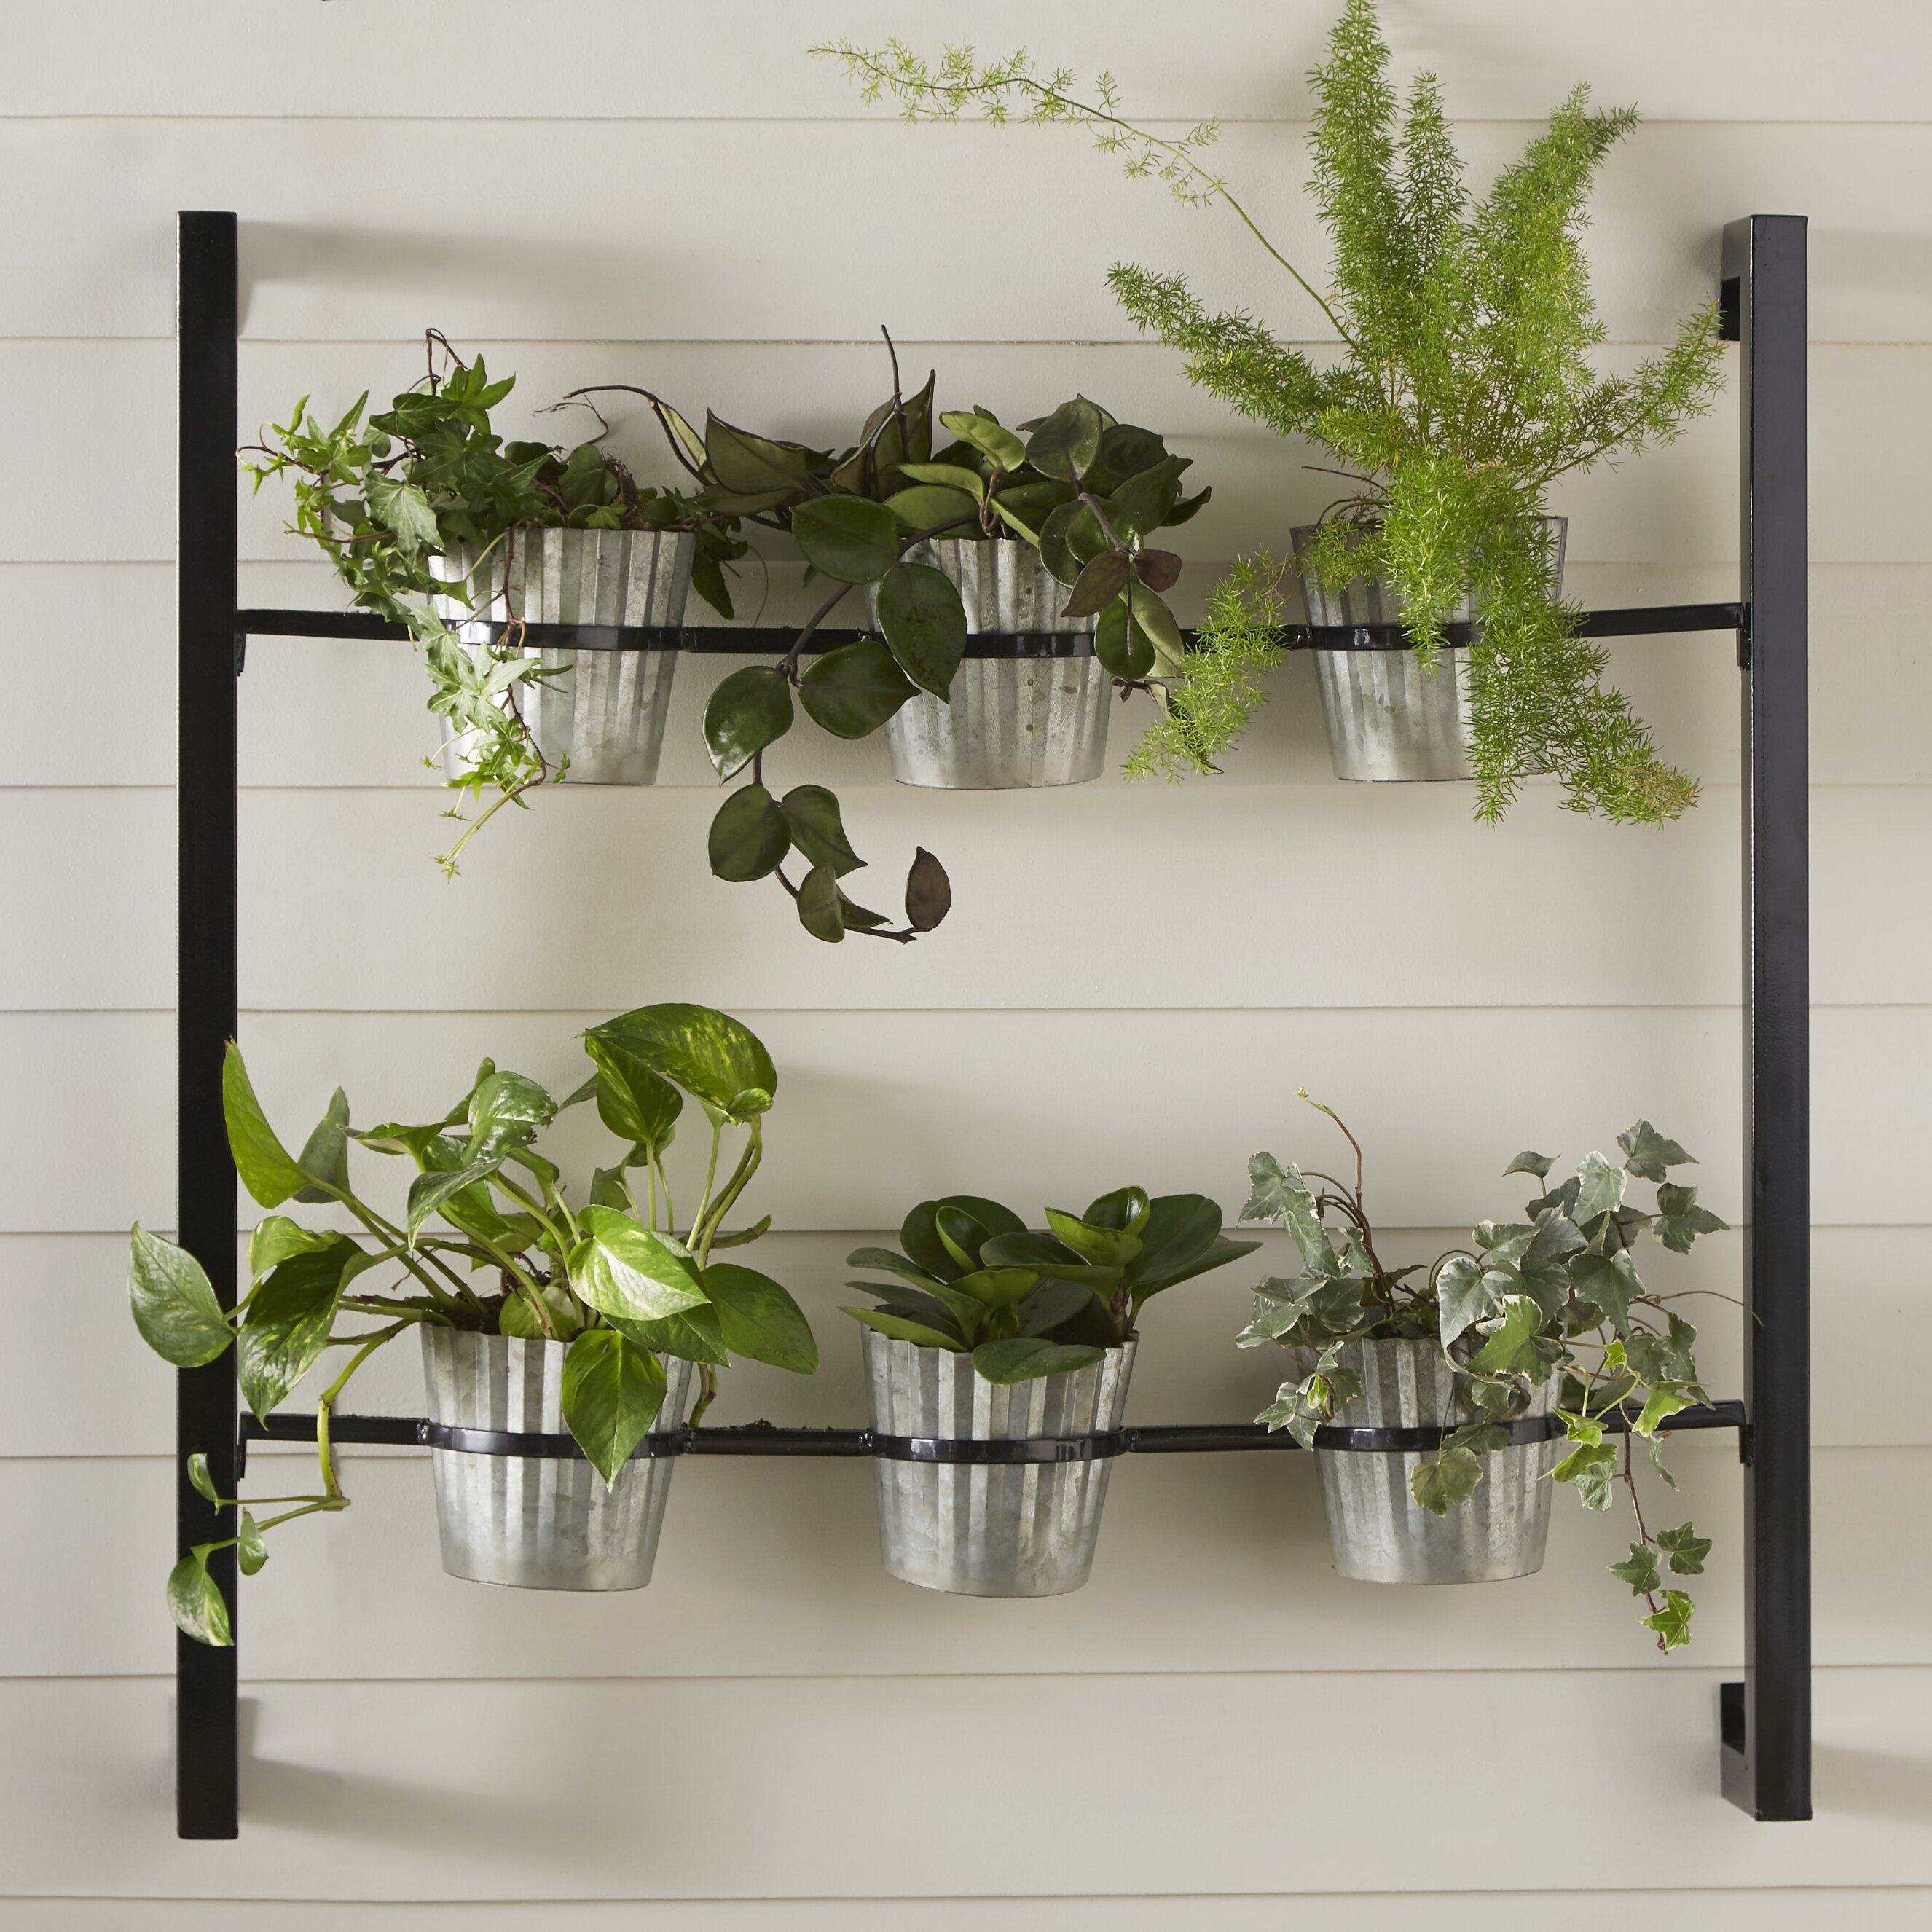 kate and laurel 6 piece groves metal wall planter set. Black Bedroom Furniture Sets. Home Design Ideas